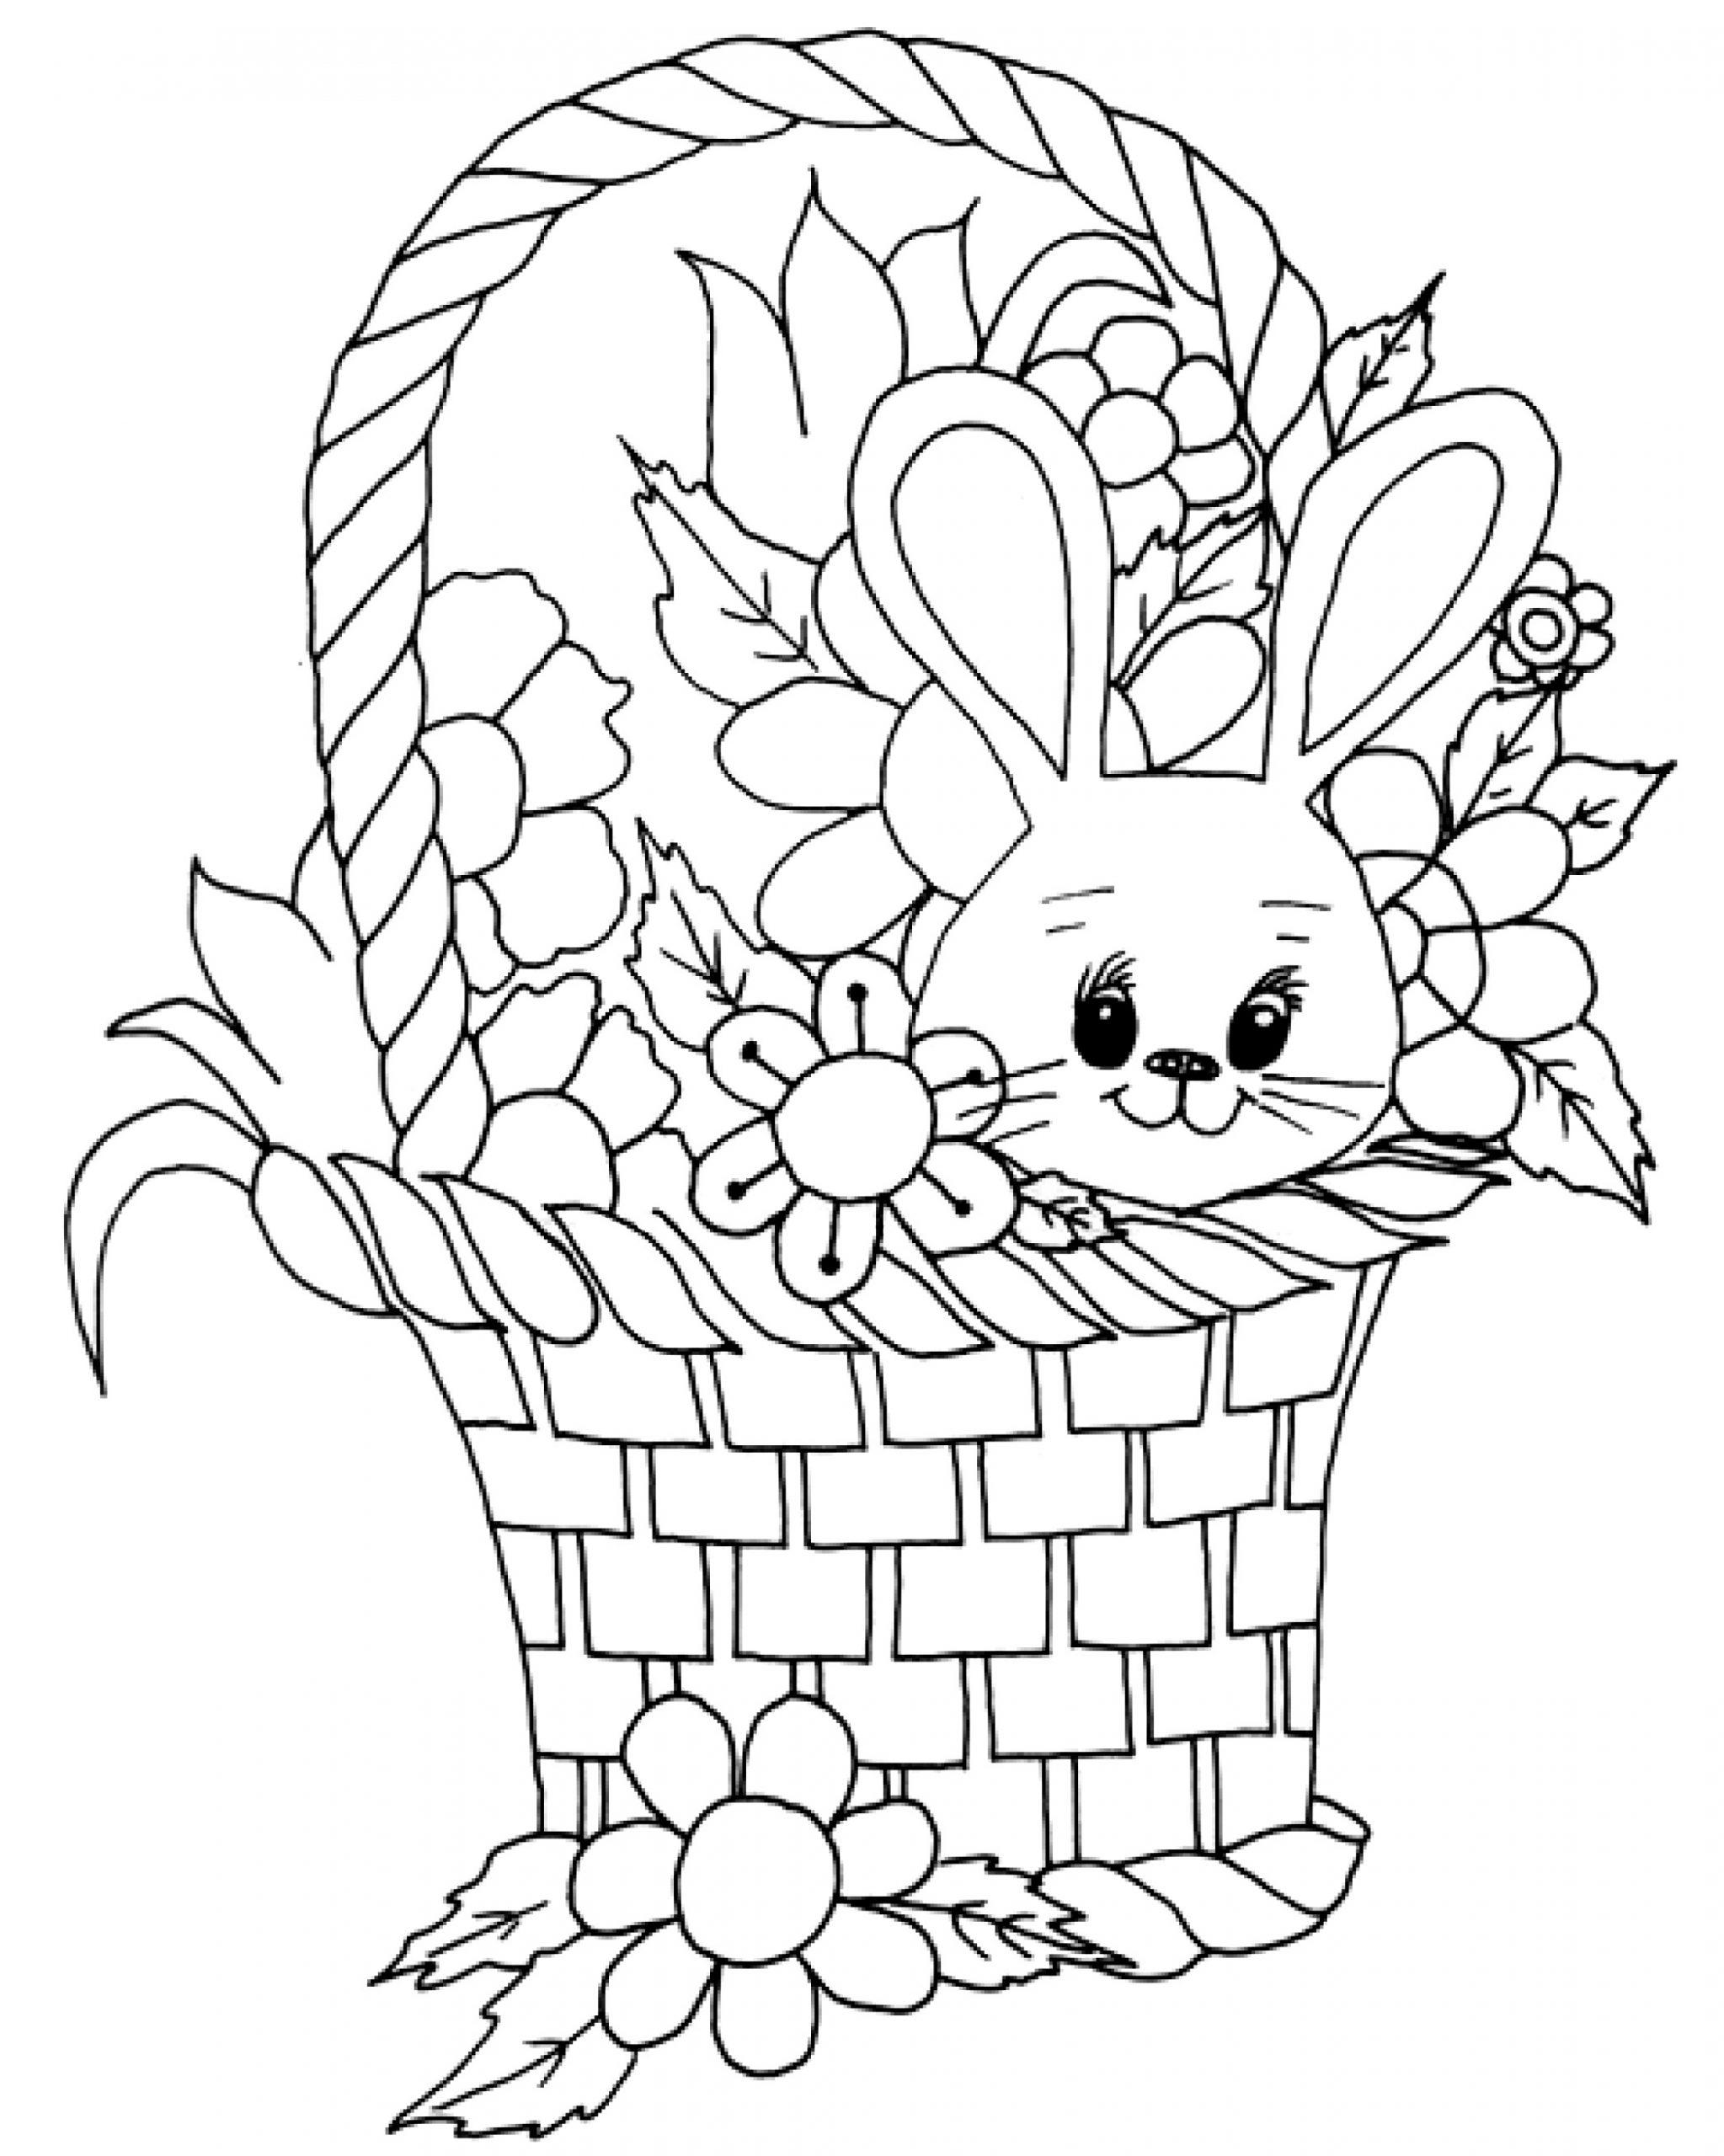 Ausmalbilder Frühling | Mytoys-Blog bestimmt für Ausmalbilder Frühling Kostenlos